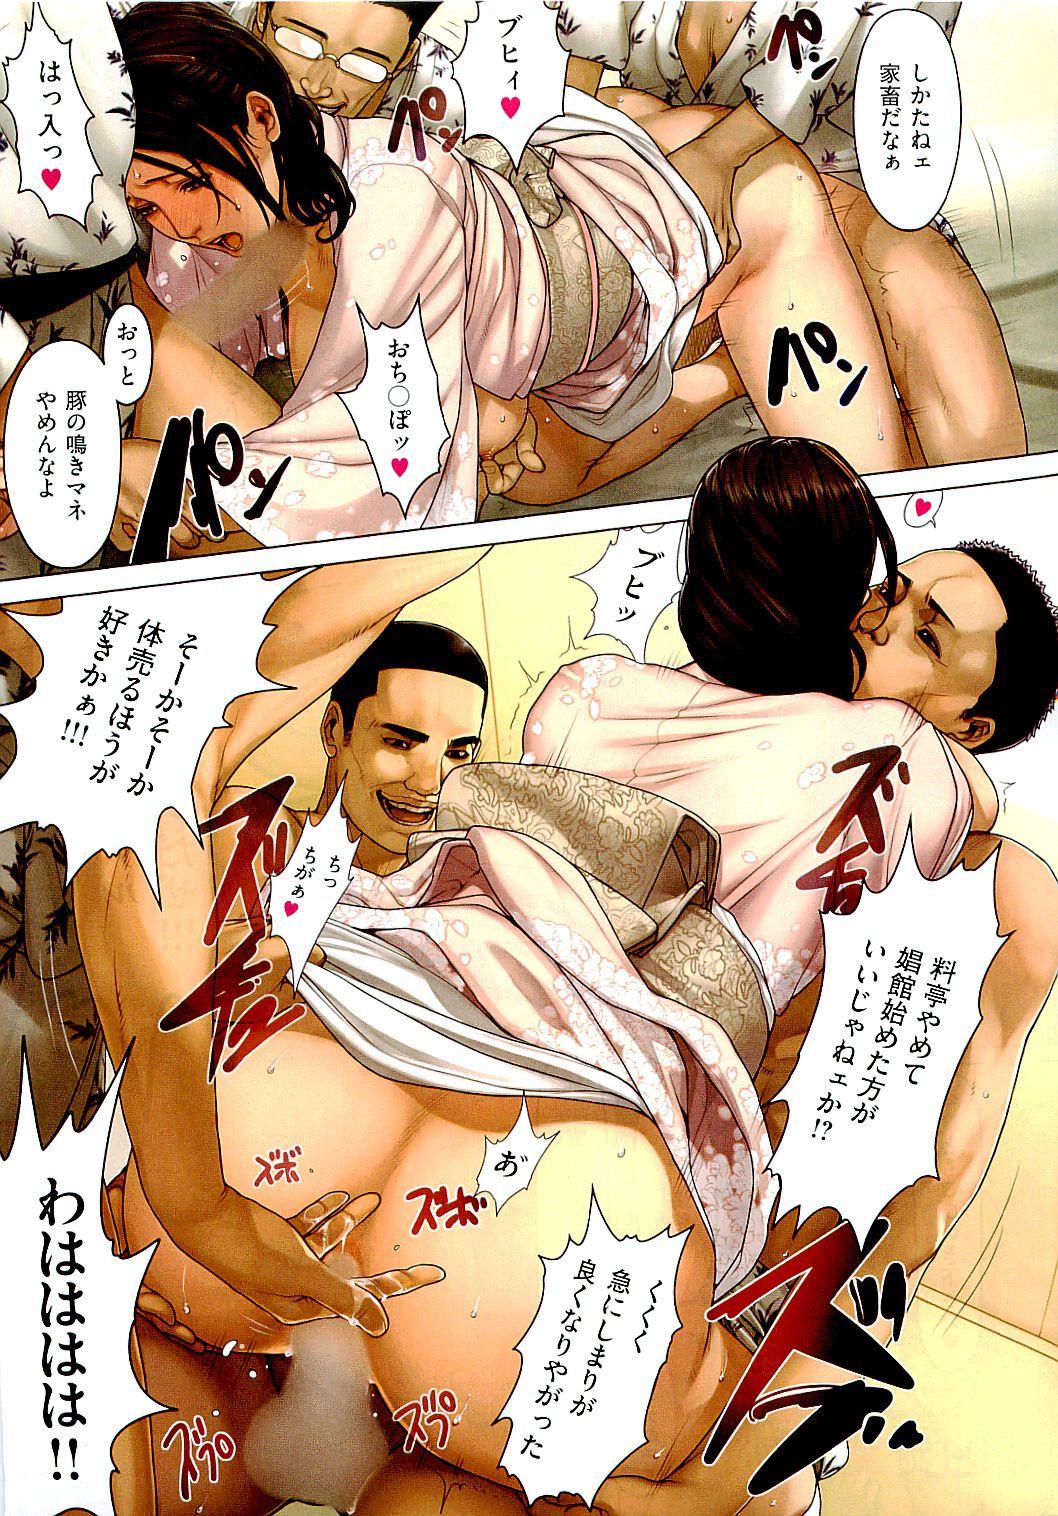 Oda non — Сборник хентай манги [Ptcen] [RUS,ENG,JAP] Manga Hentai